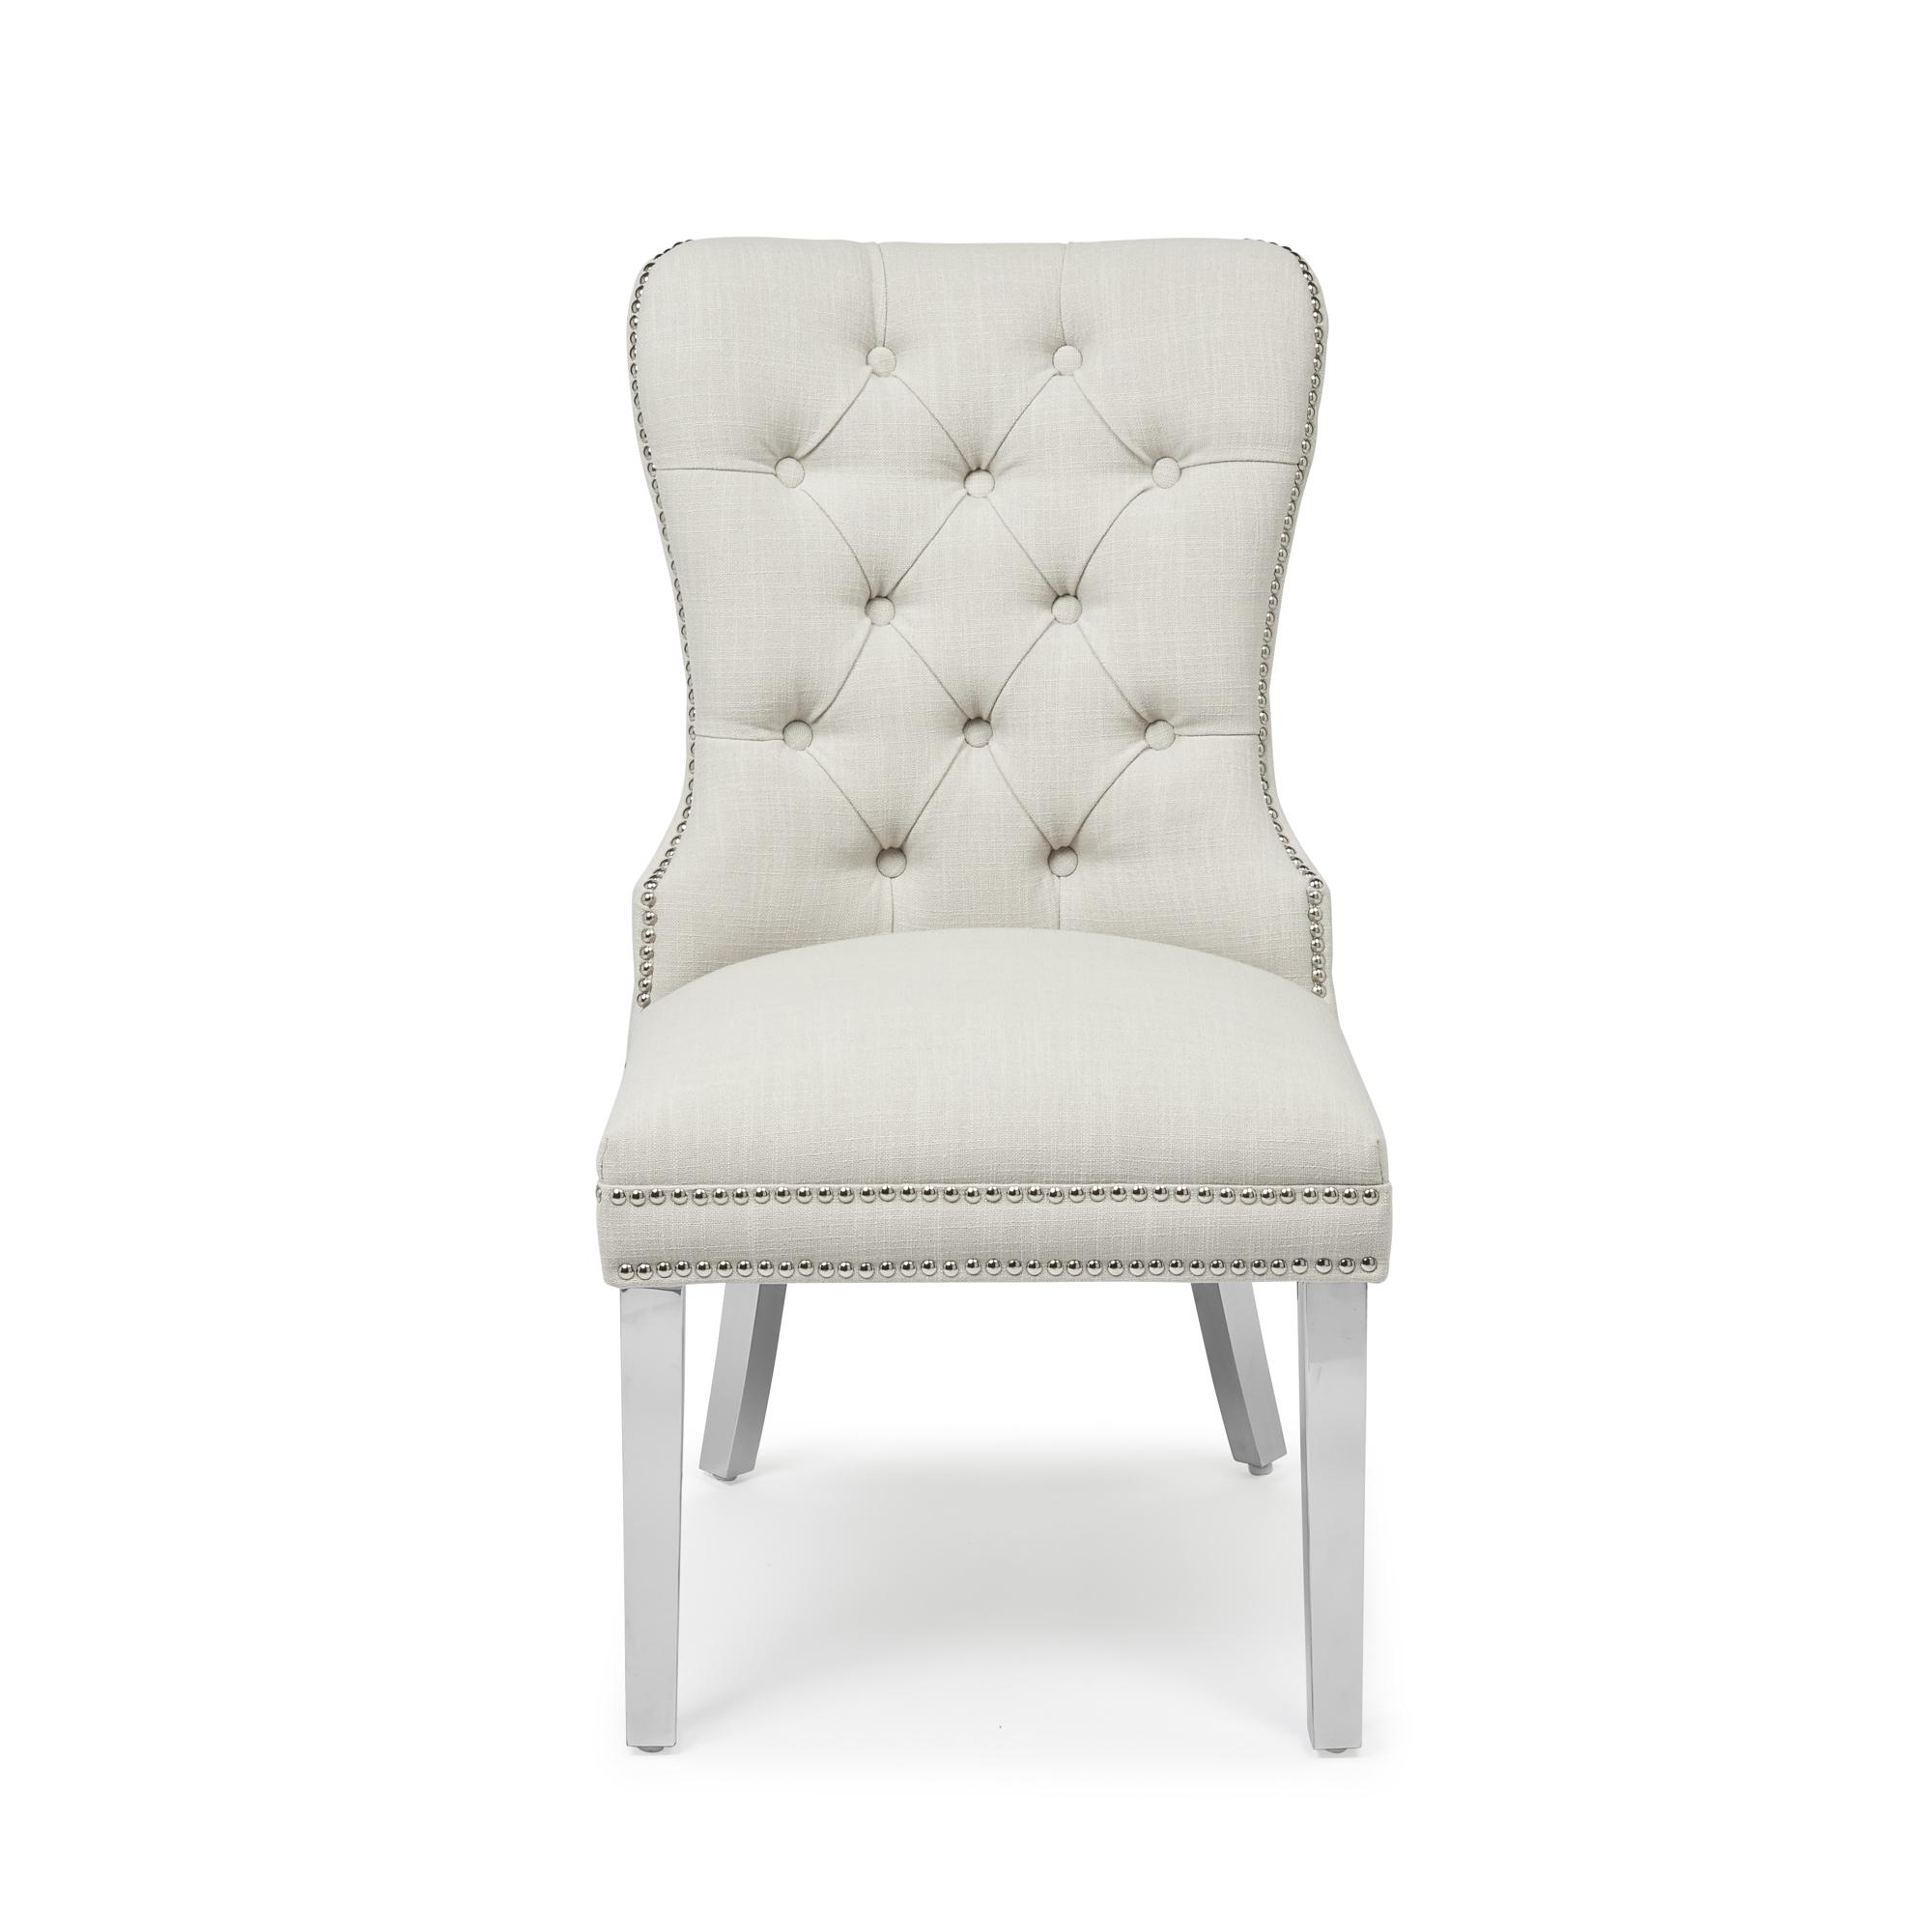 Hale Cream Linen Studded & Hoop Dining Chair